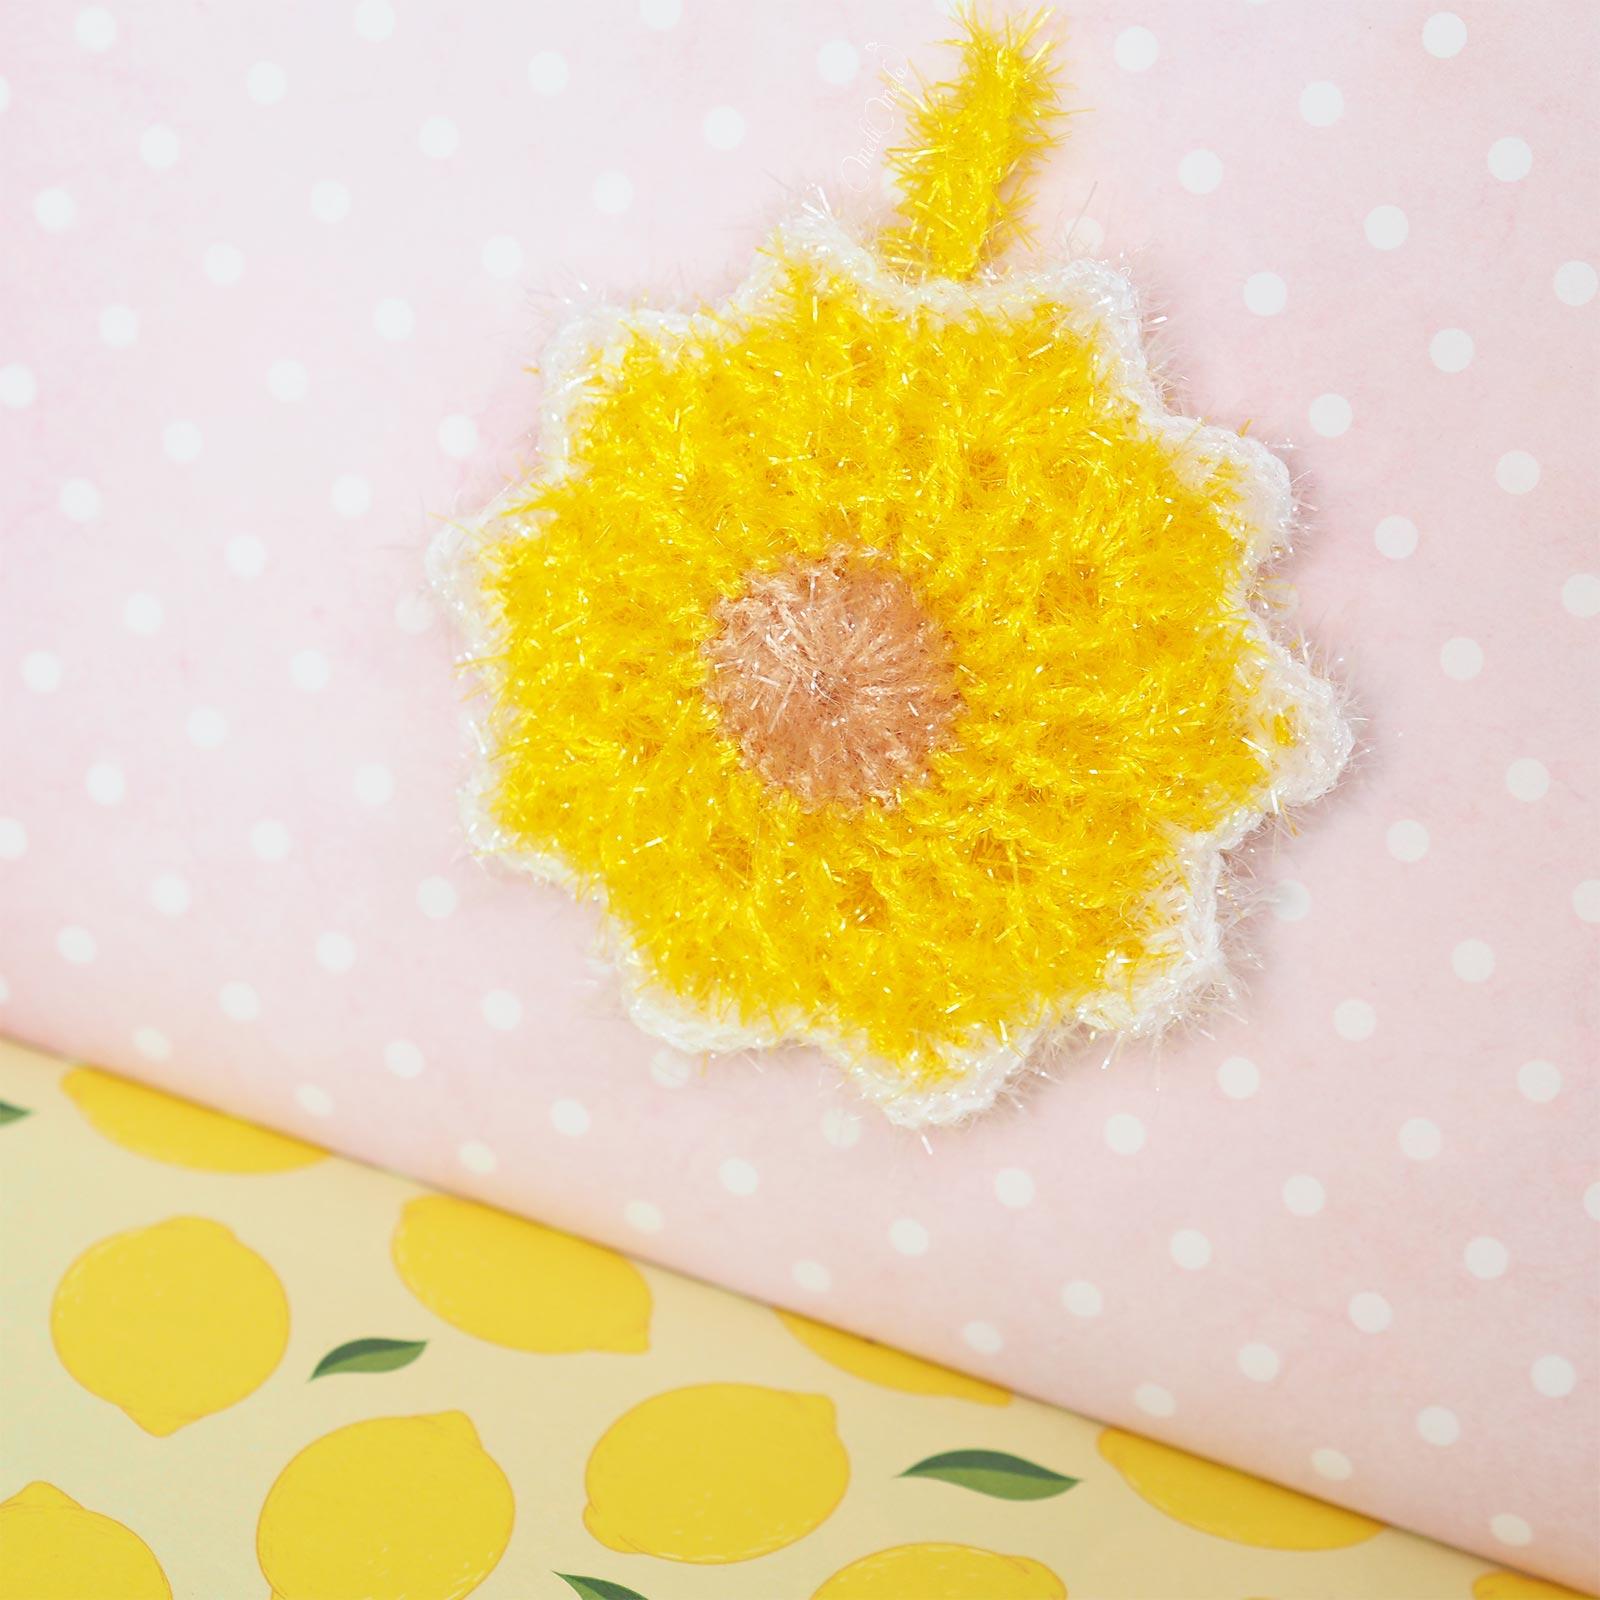 éponge tawashi soleil étoile diymelimelo crochet laboutiquedemelimelo